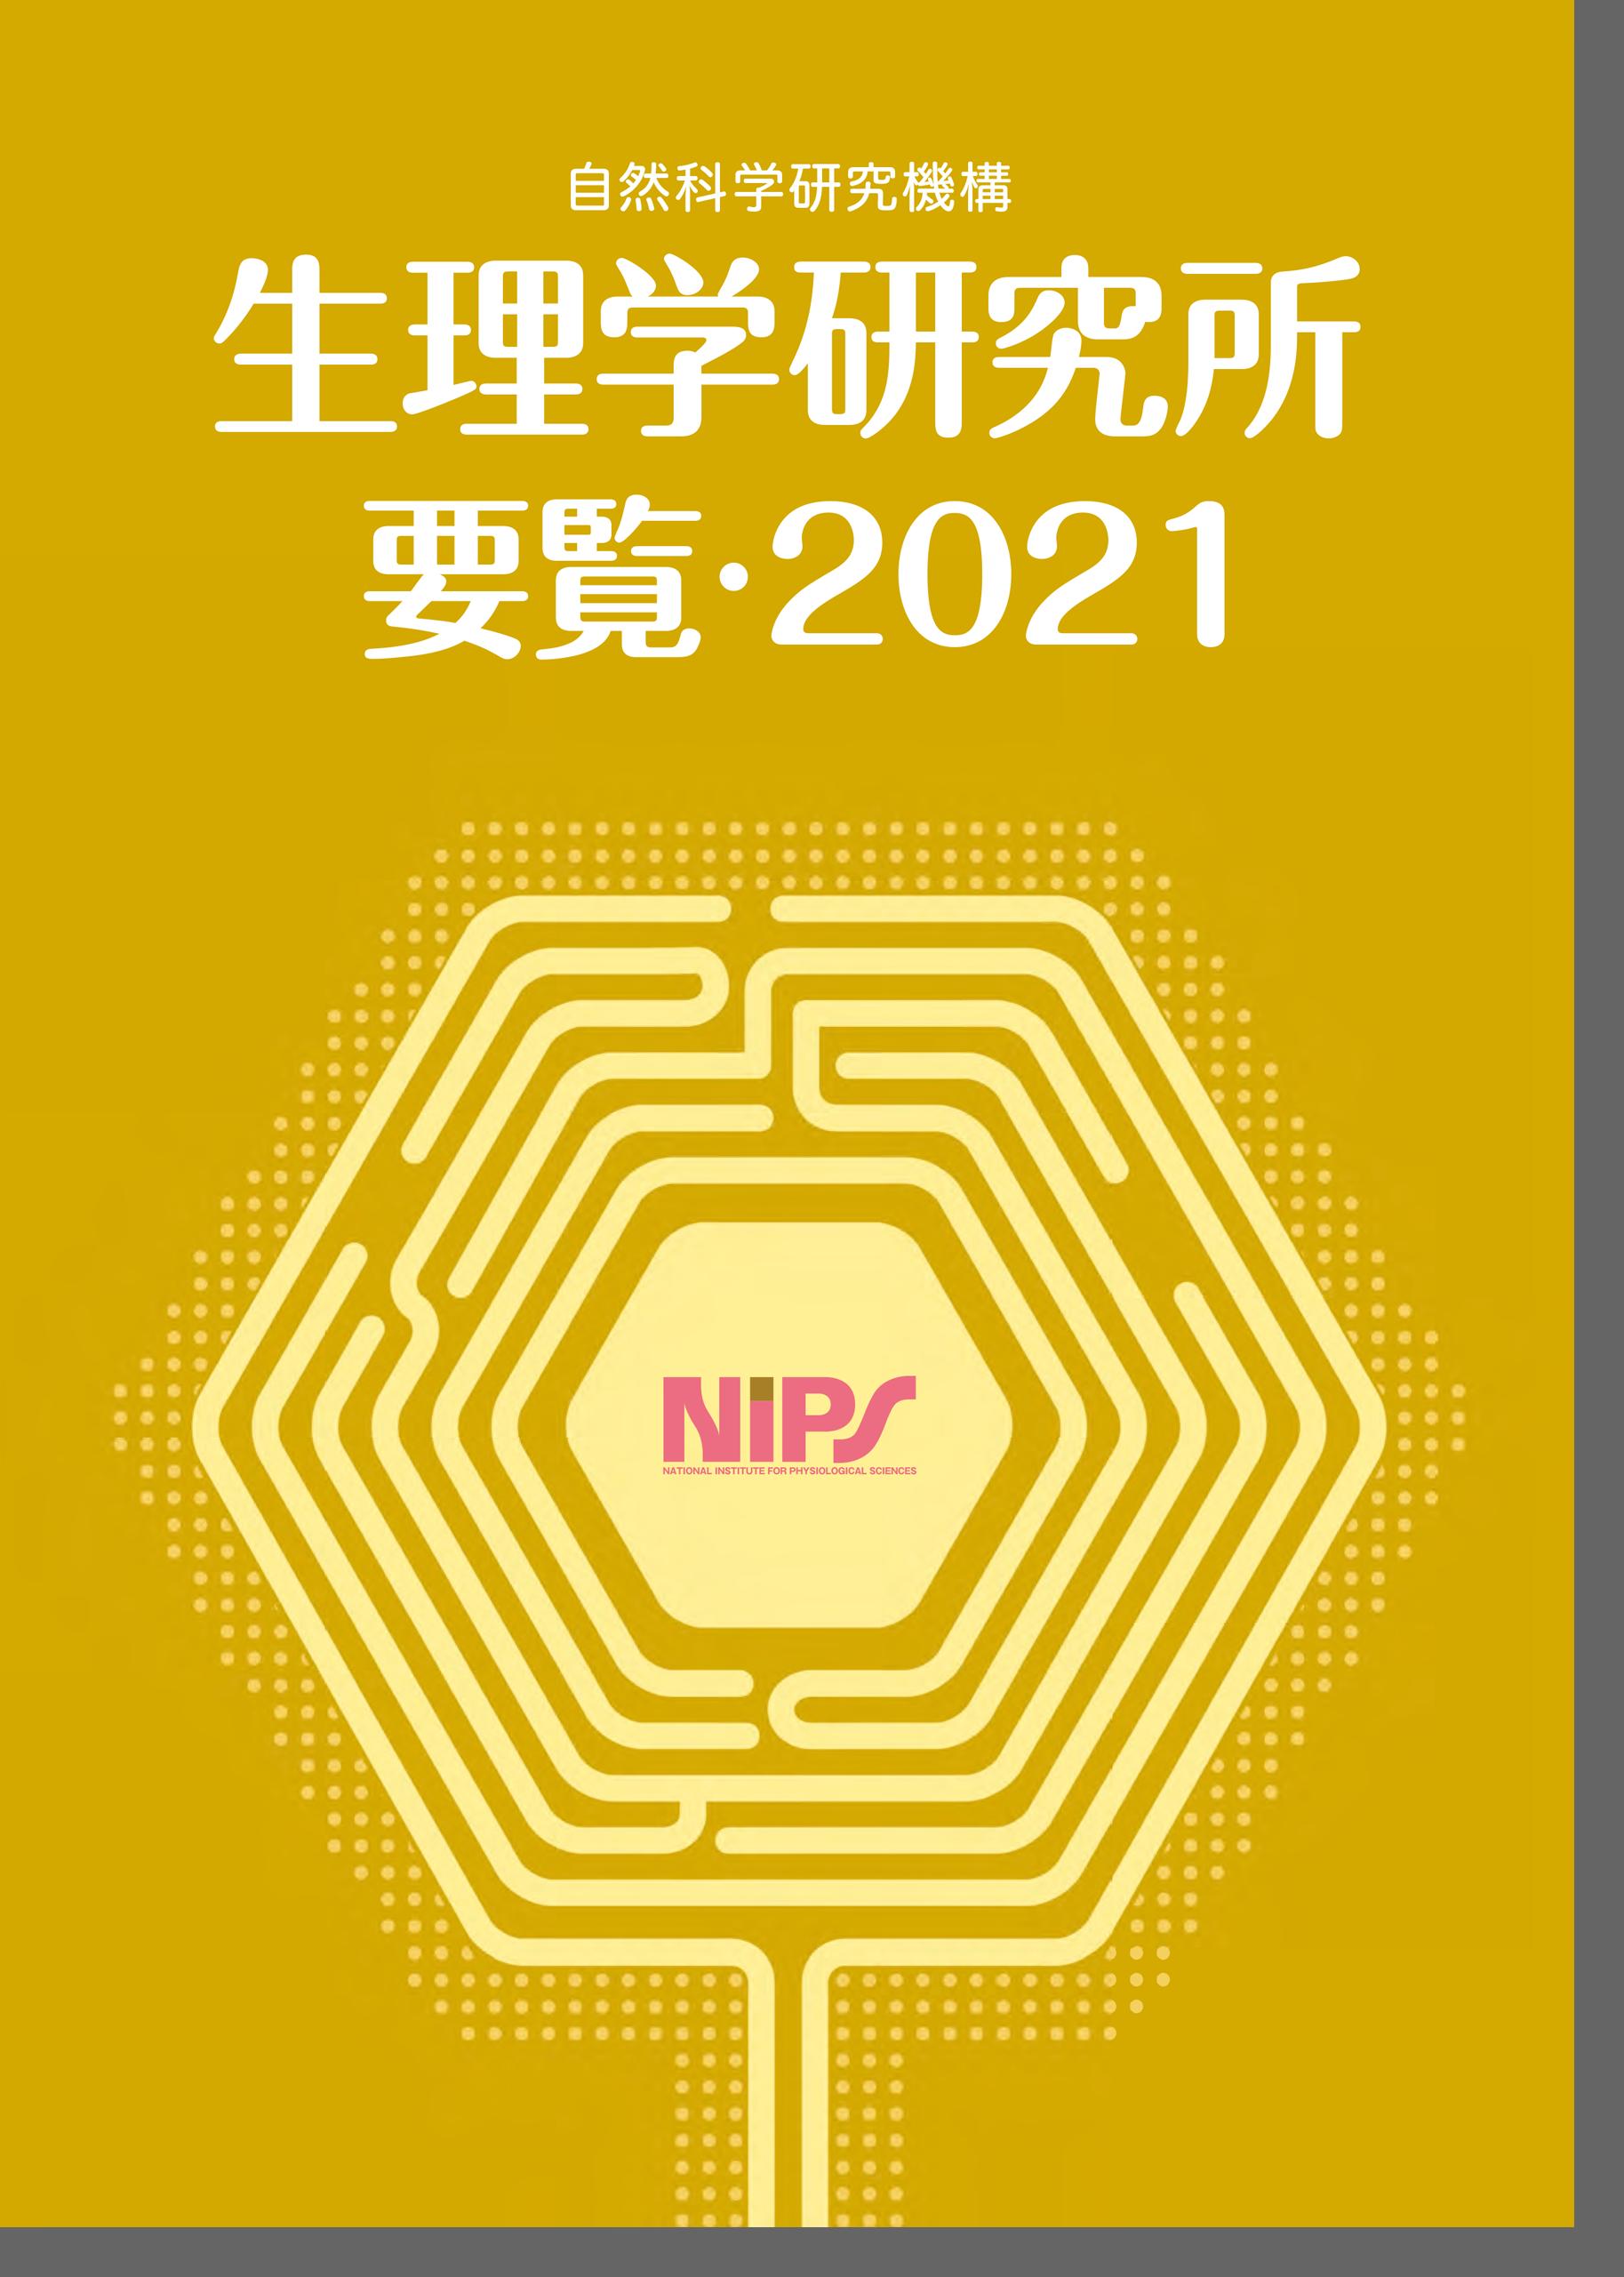 2021yourantitle_jpn.png